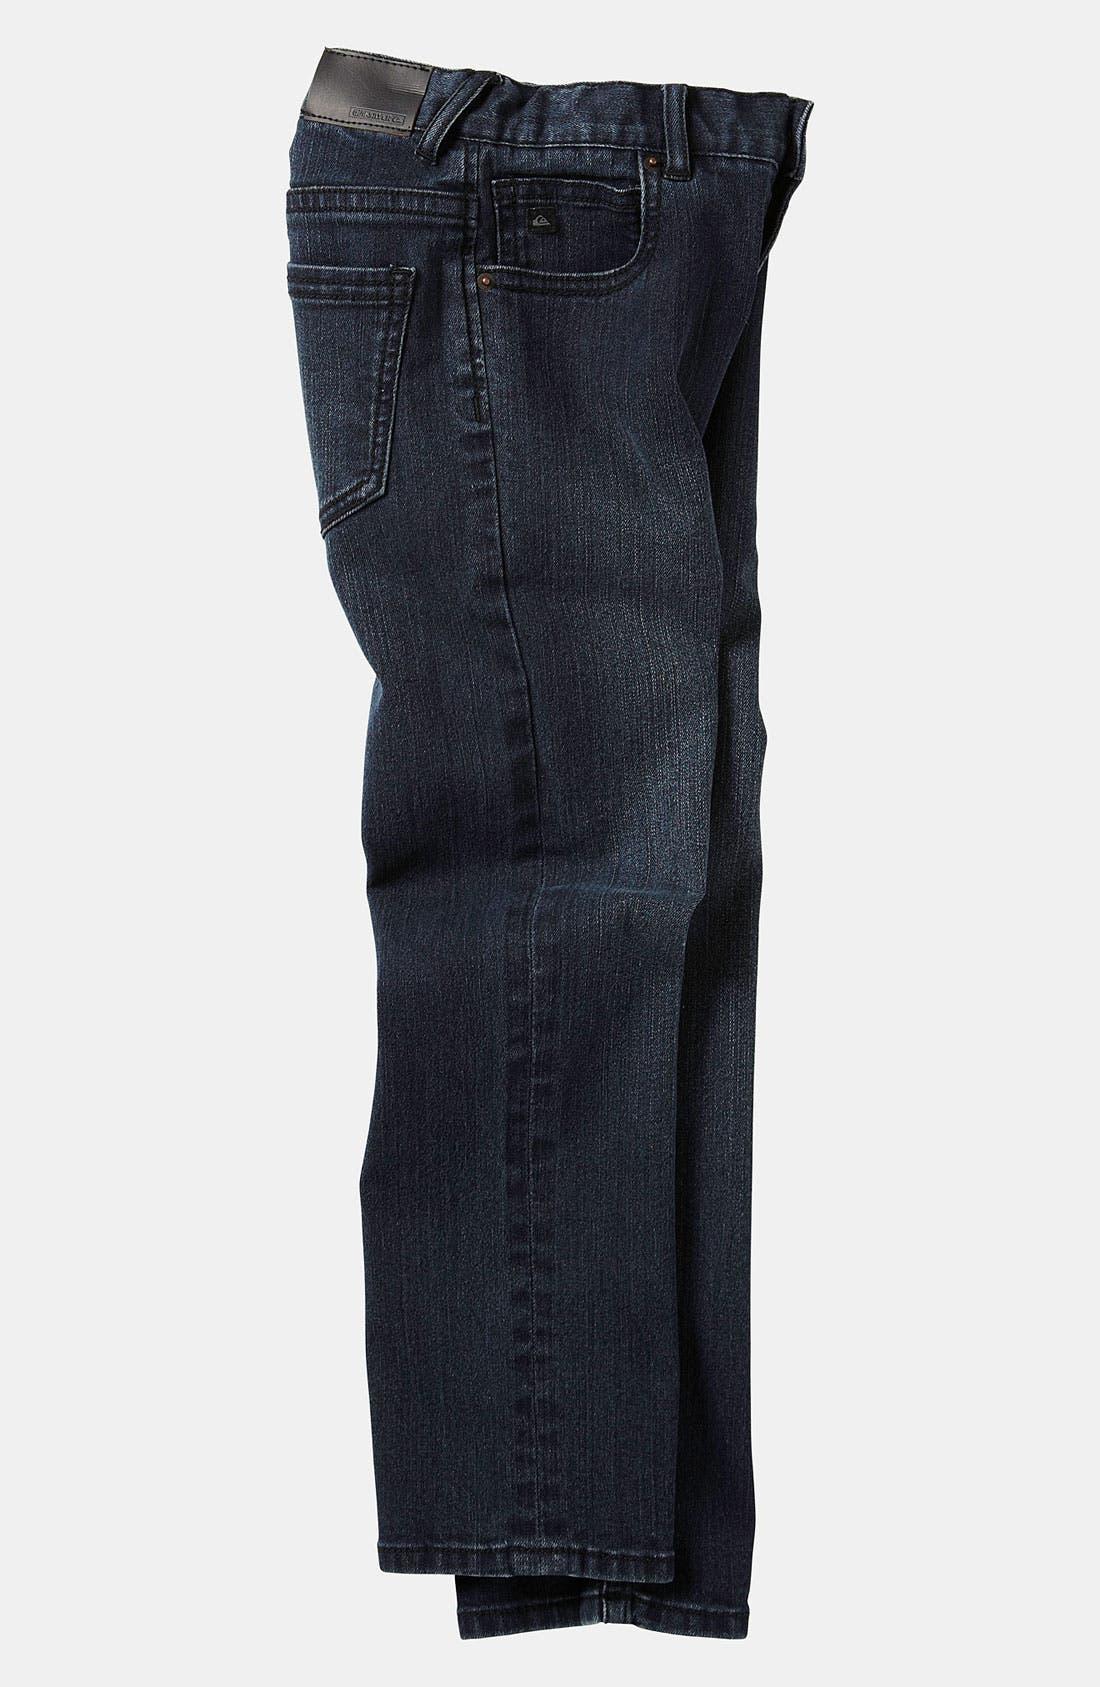 Alternate Image 3  - Quiksilver 'Distortion' Jeans (Toddler)